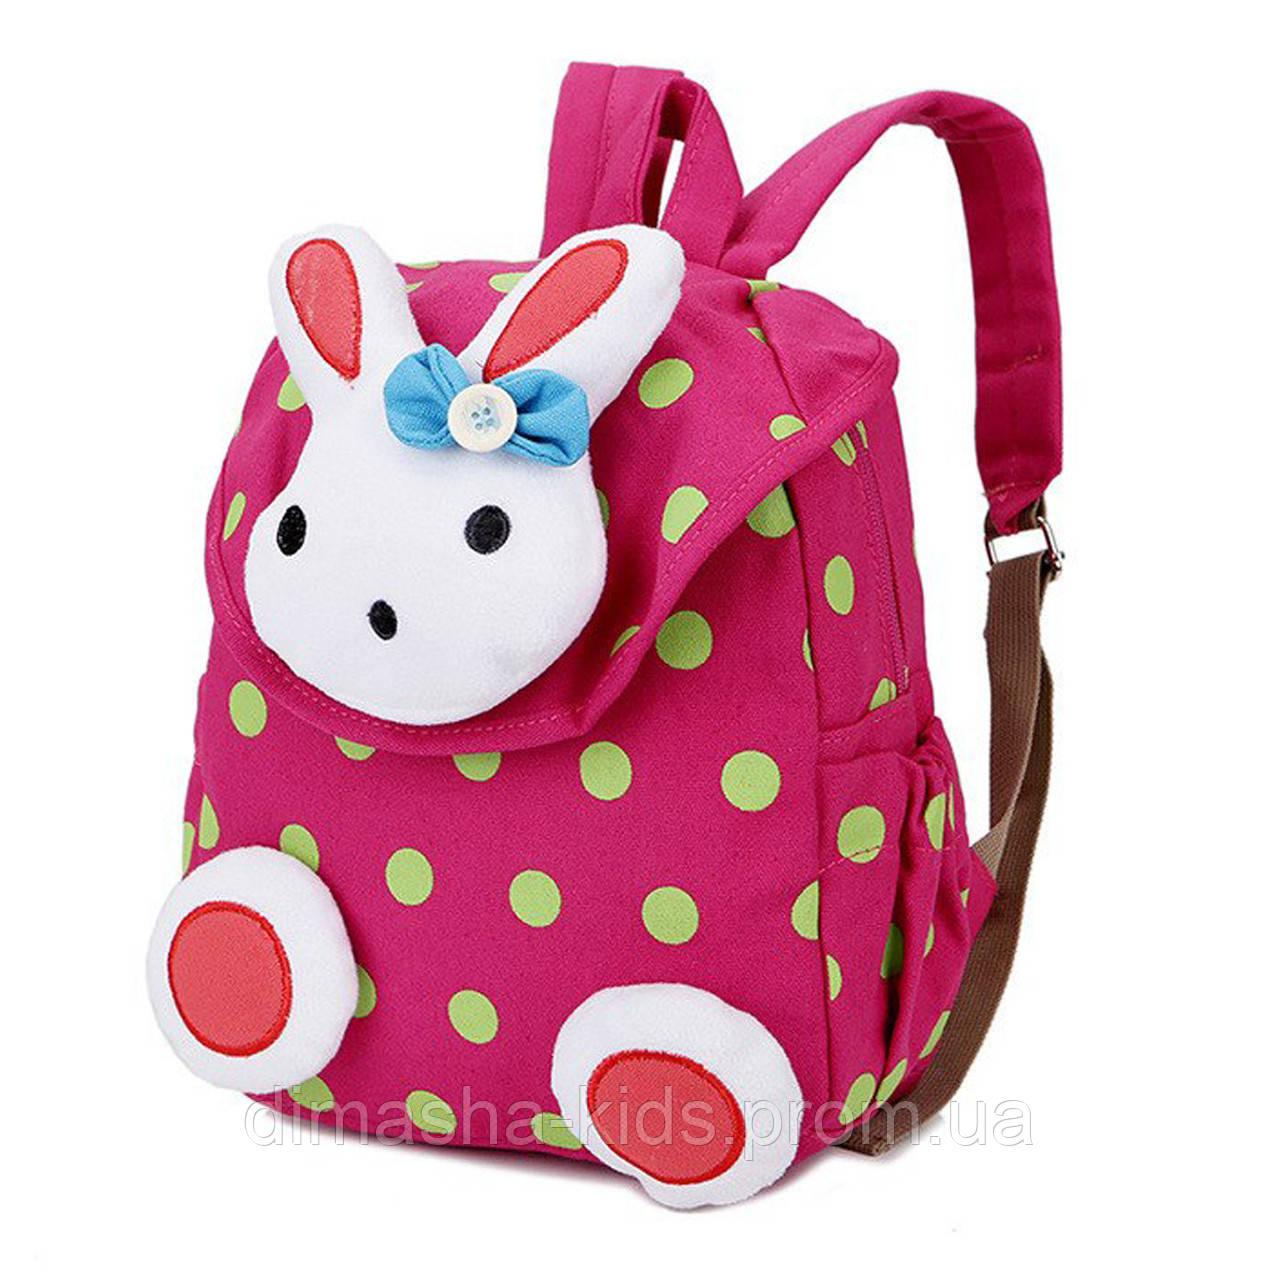 c3f8b5e03126 Рюкзак детский, малиновый. Зайка.: продажа, цена в Полтаве. сумки и ...